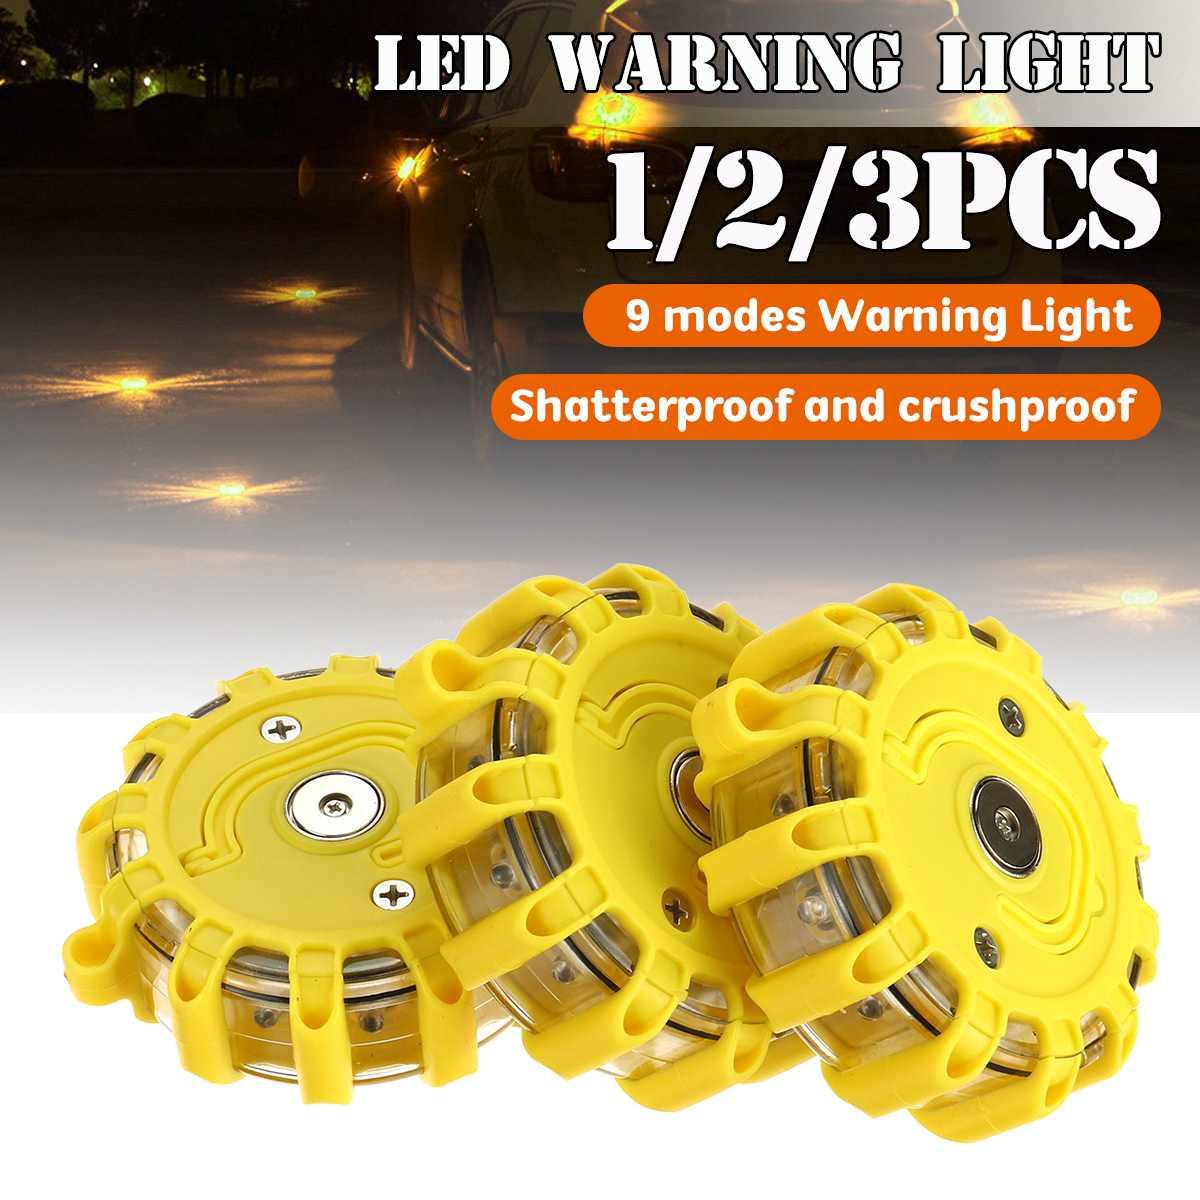 3pcs LED Road Flares Flashing Warning Light Roadside Safety Car Boat Truck Emergency Multifunction Car Light